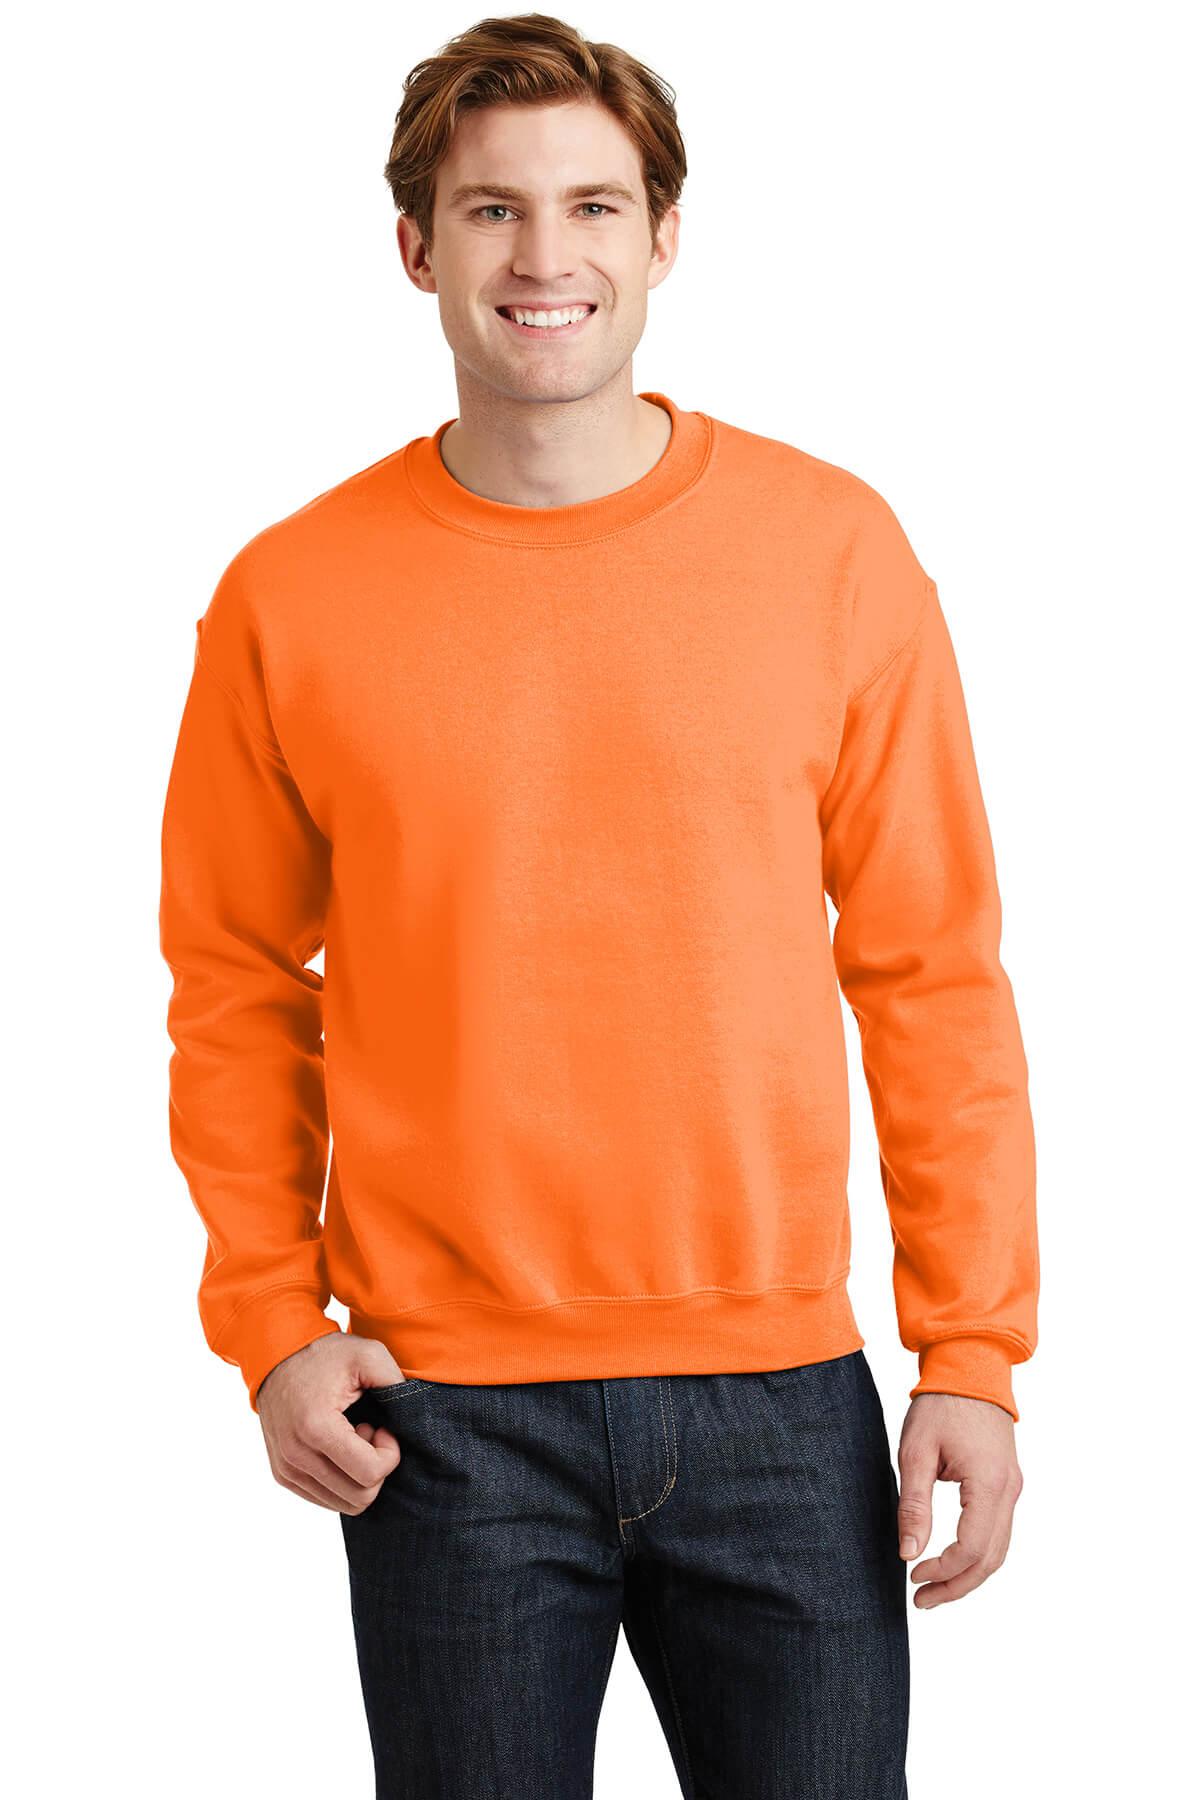 18000-southern-orange-1